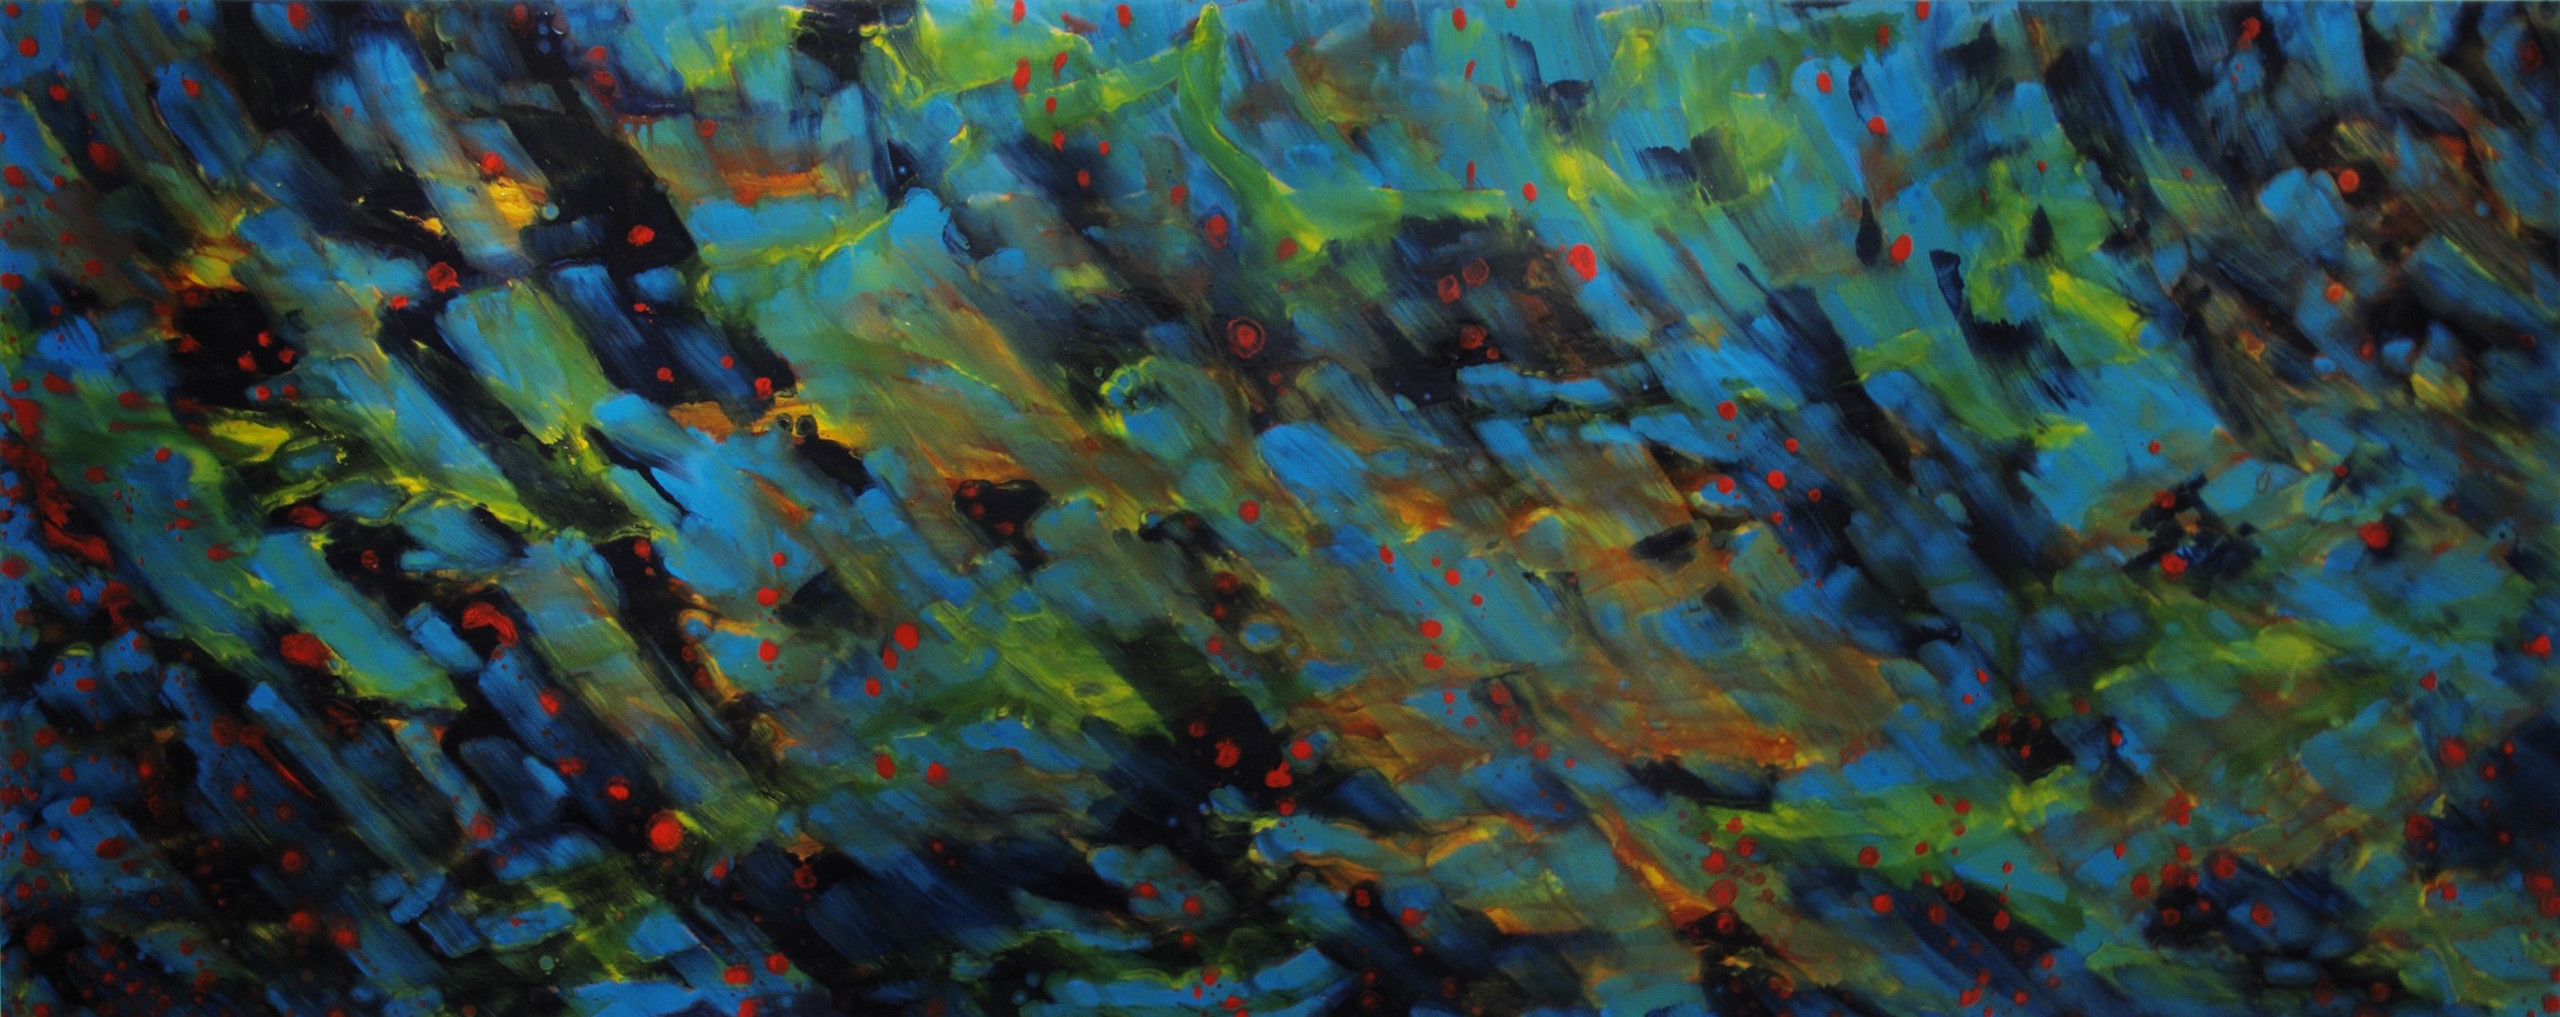 Julian Kohl - Ohne Titel (Spazieränge), 160x400cm Öl auf Leinwand 2014